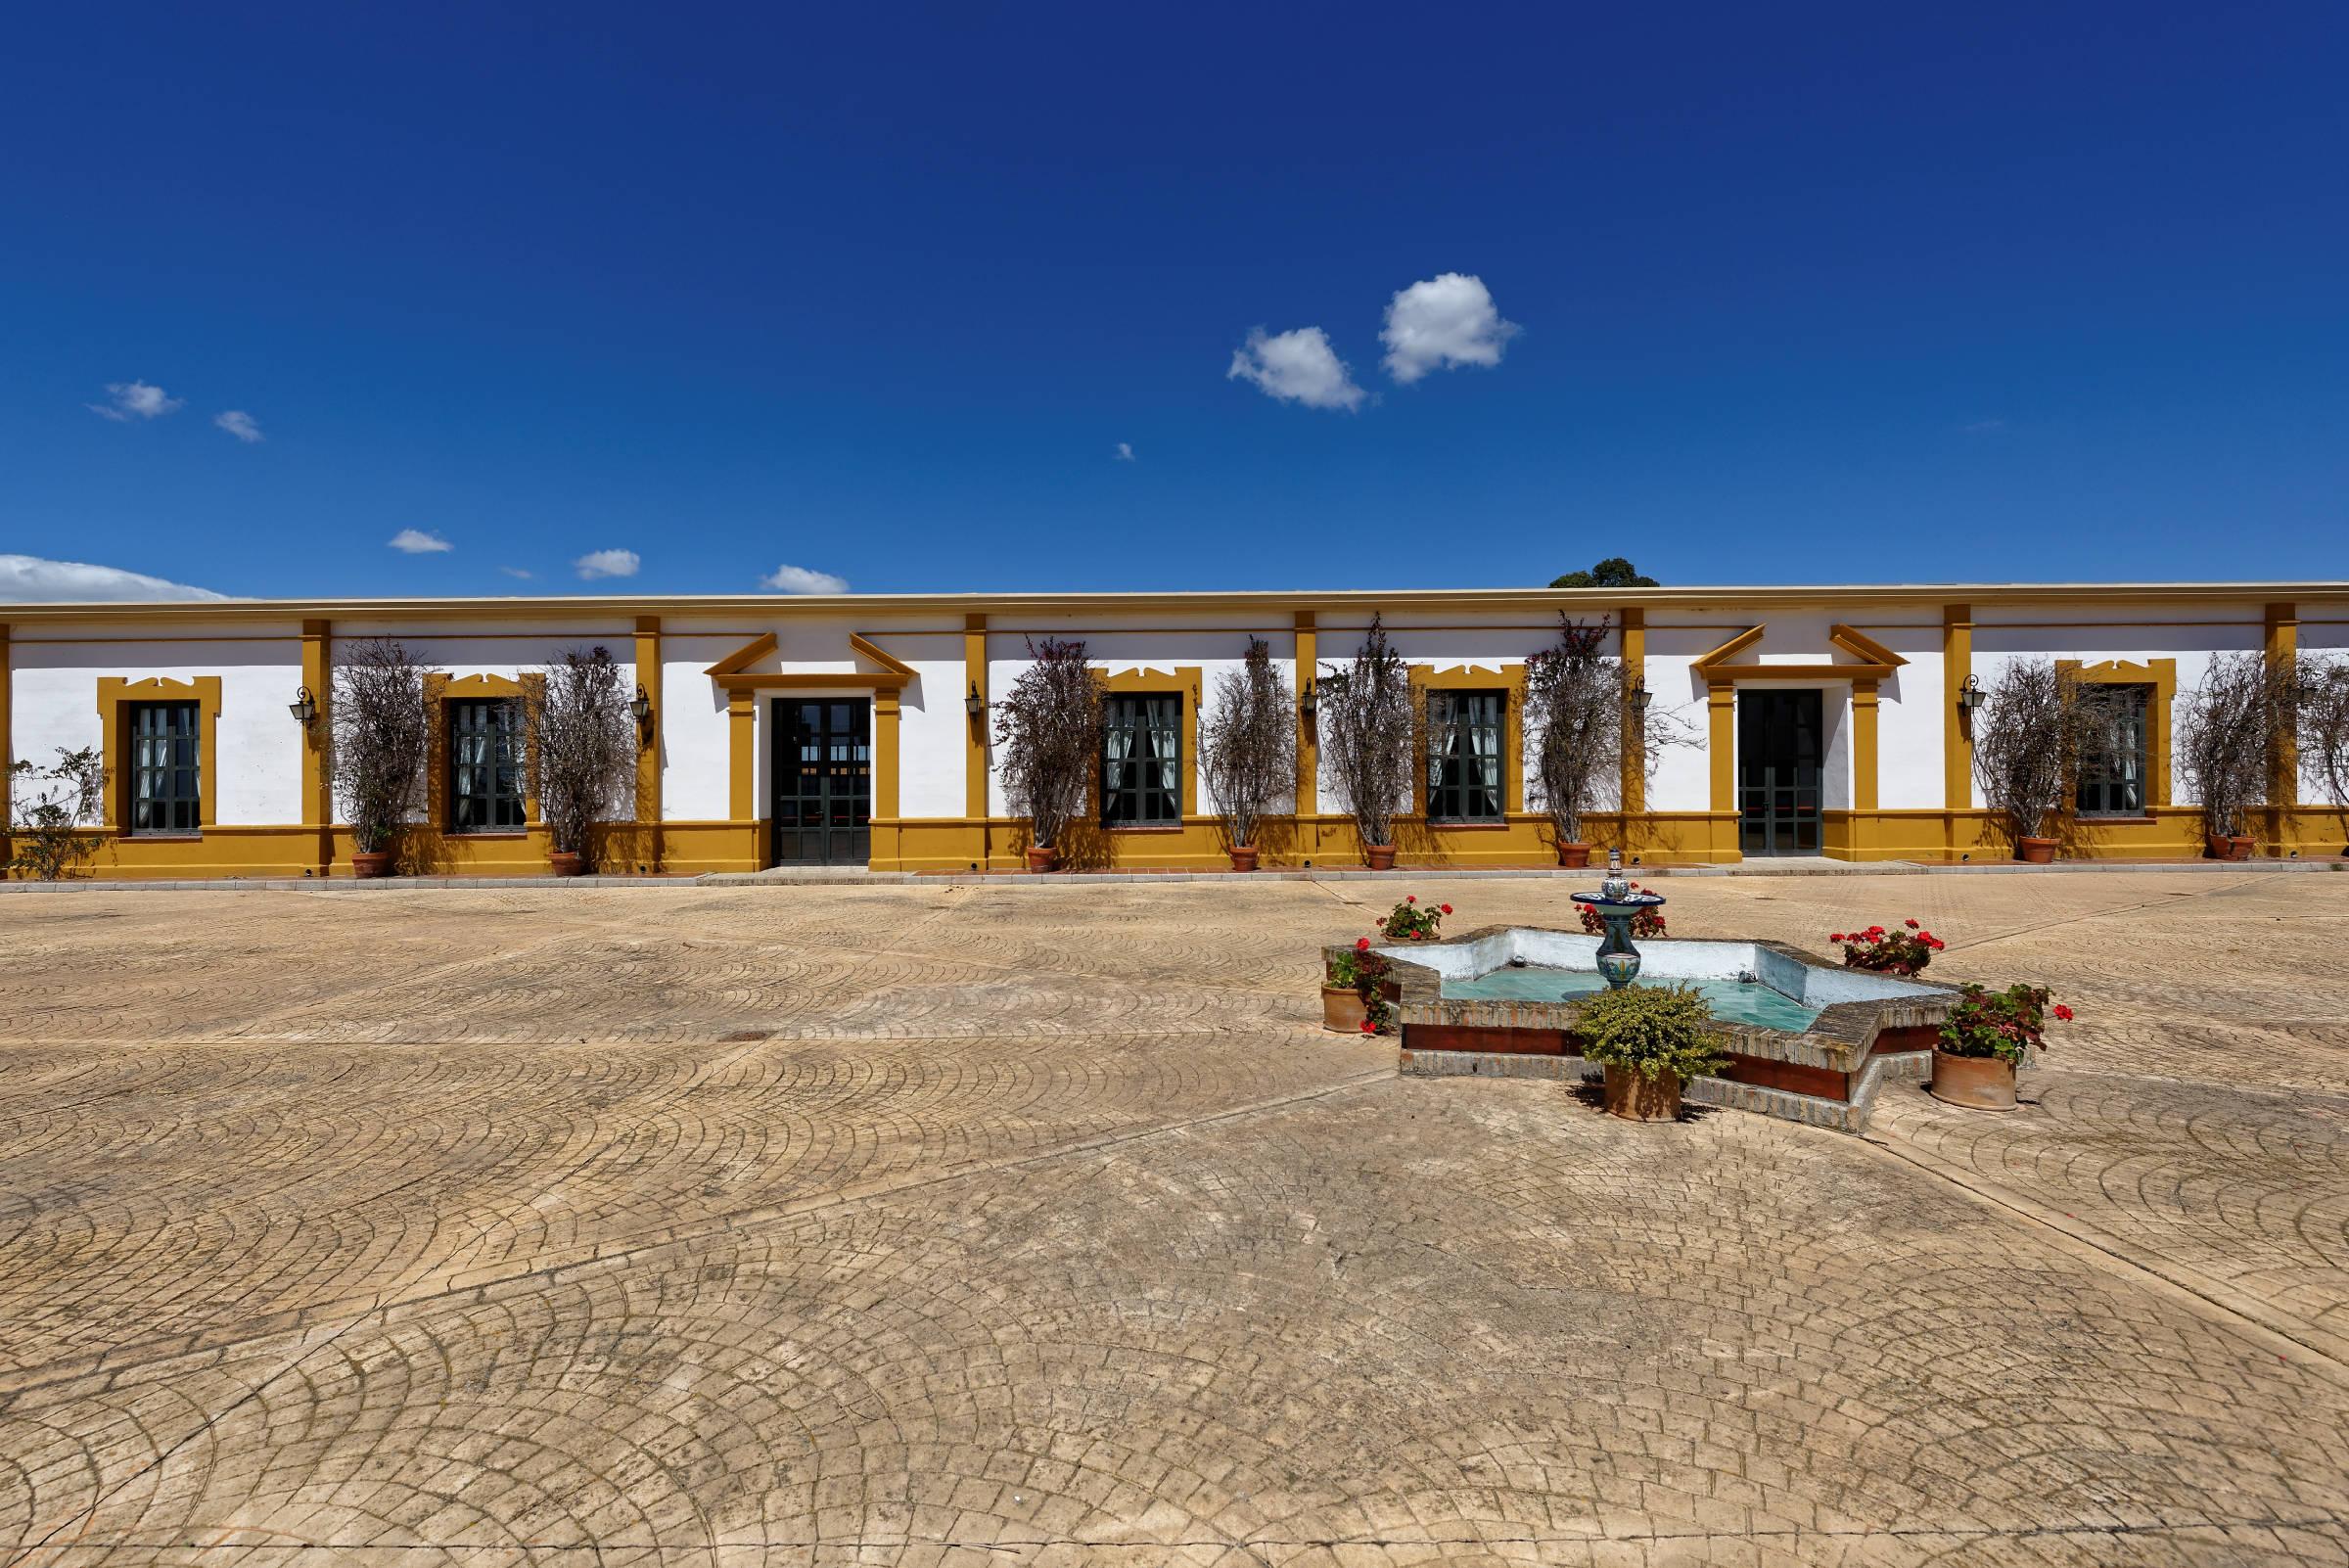 160414-Isla minima - Escobar (Andalousie) (44)